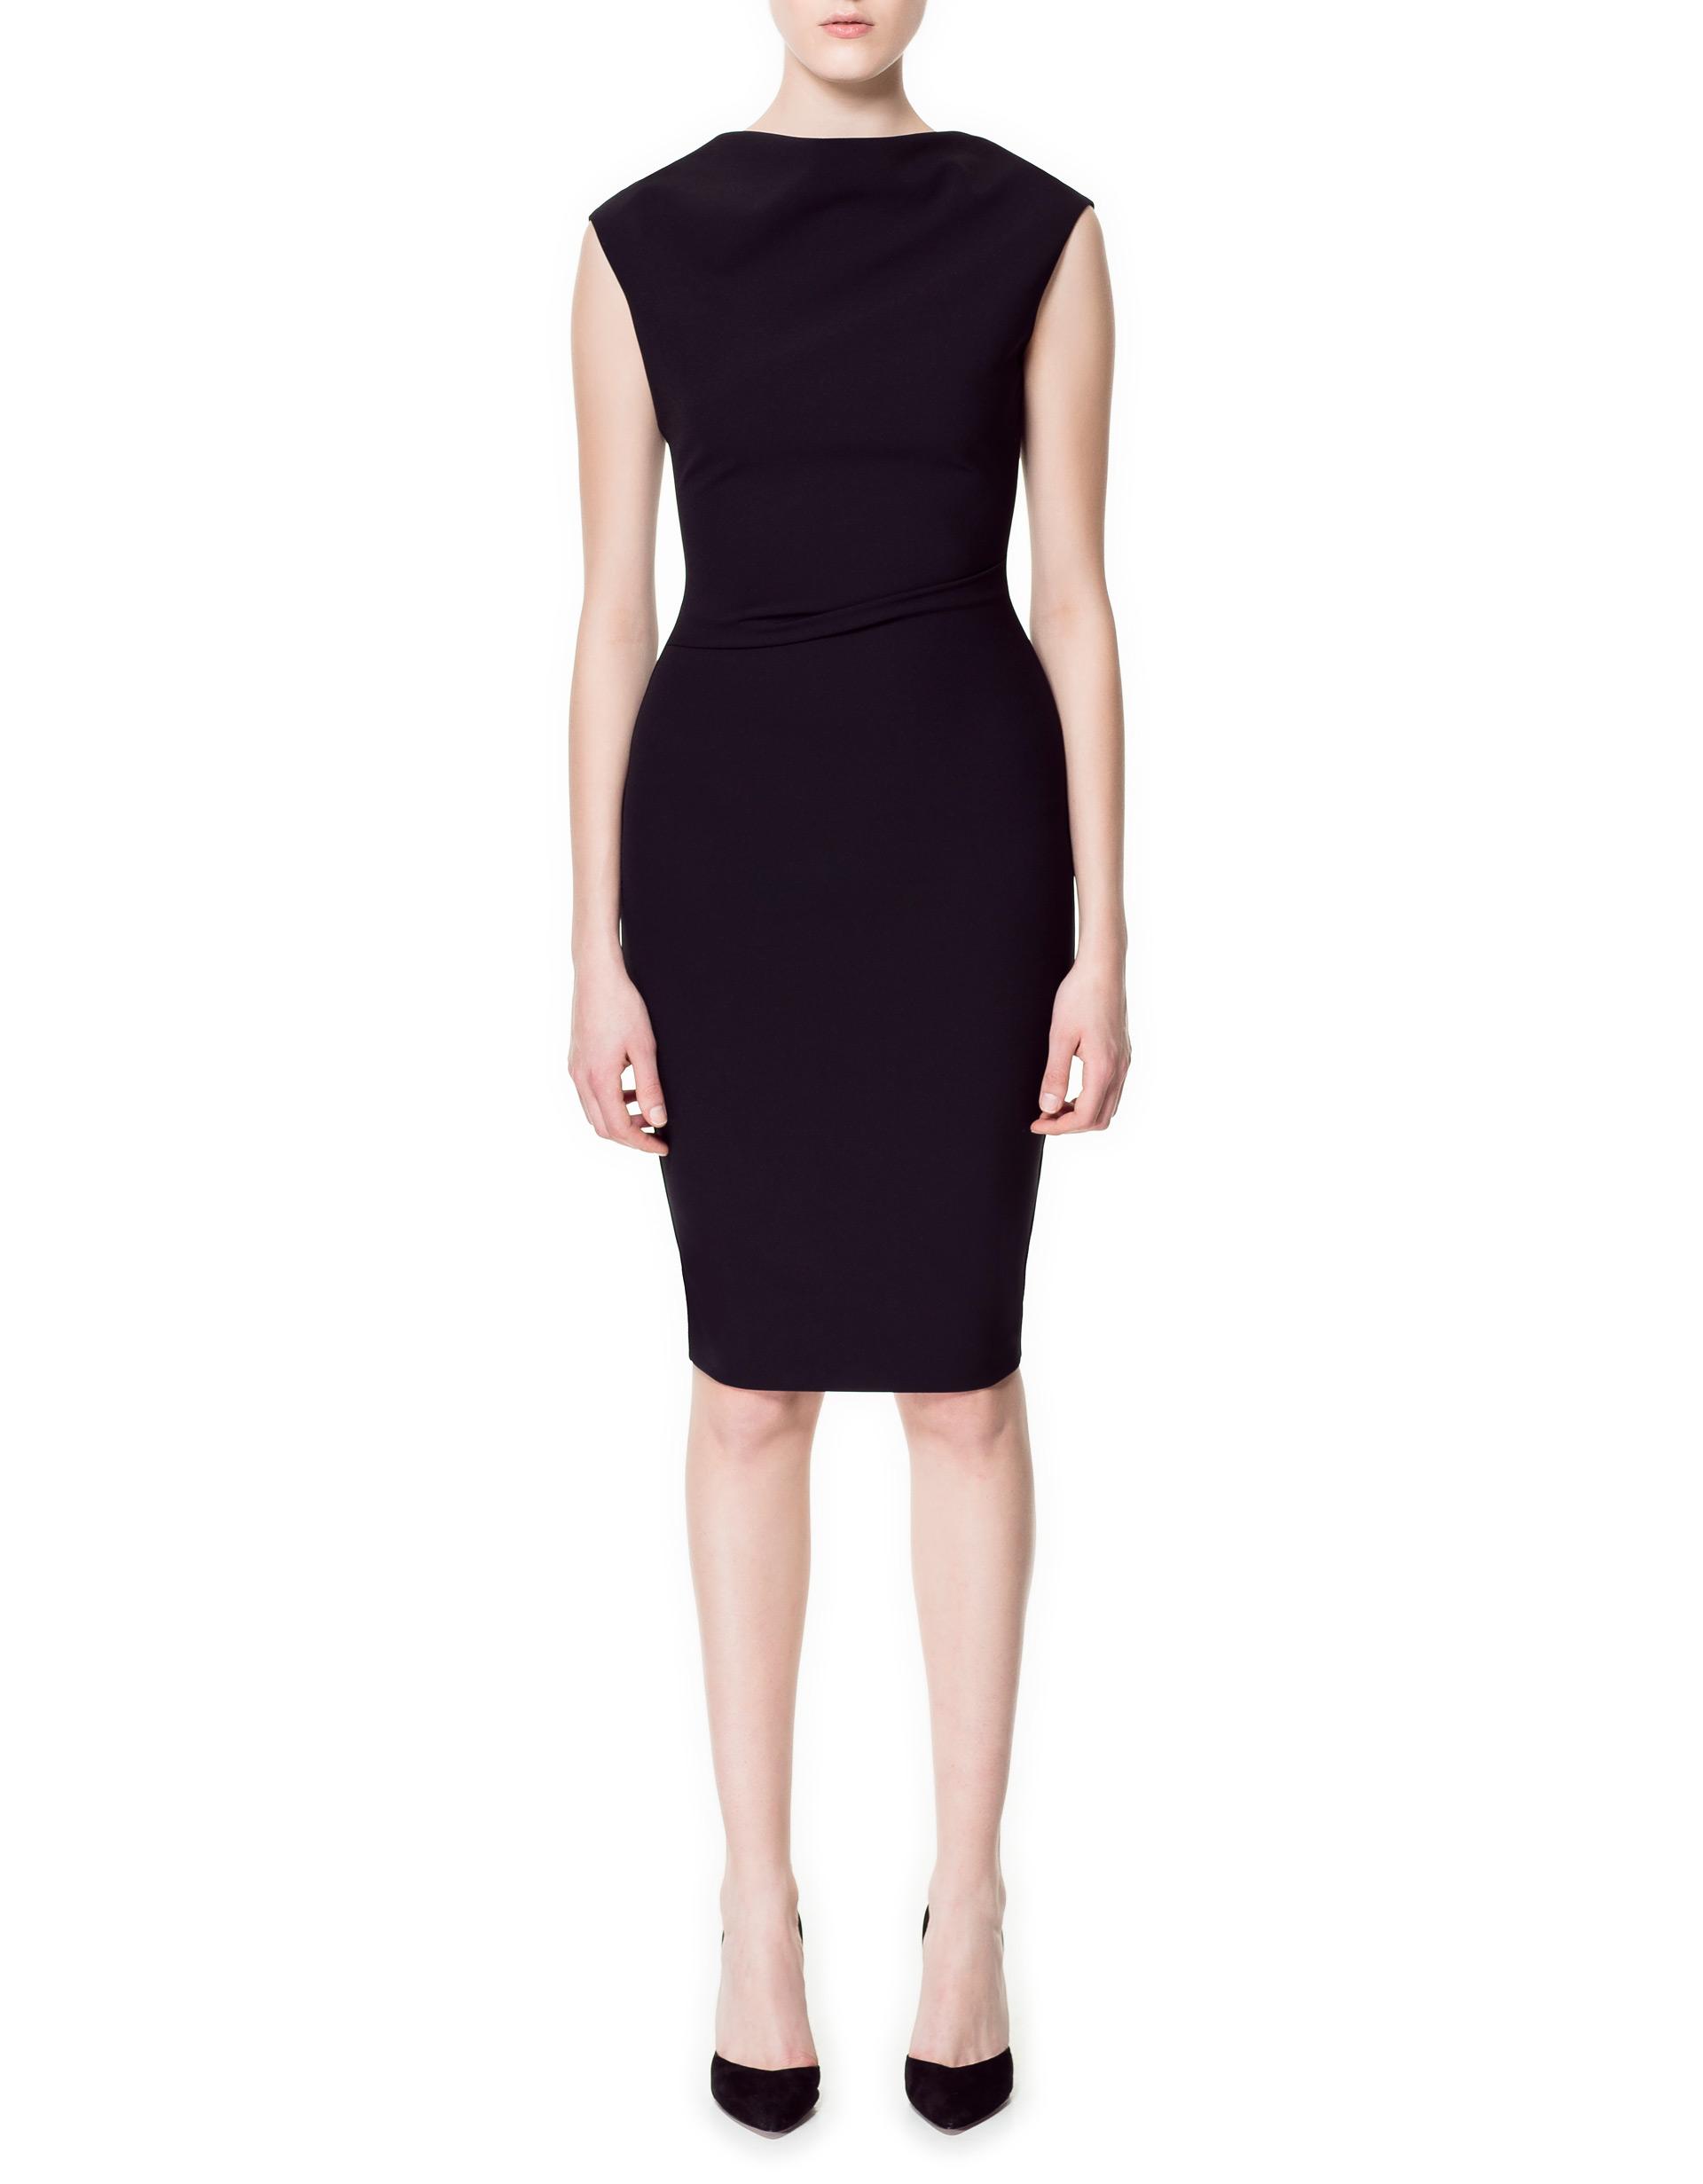 Plain Black Dresses | Cocktail Dresses 2016